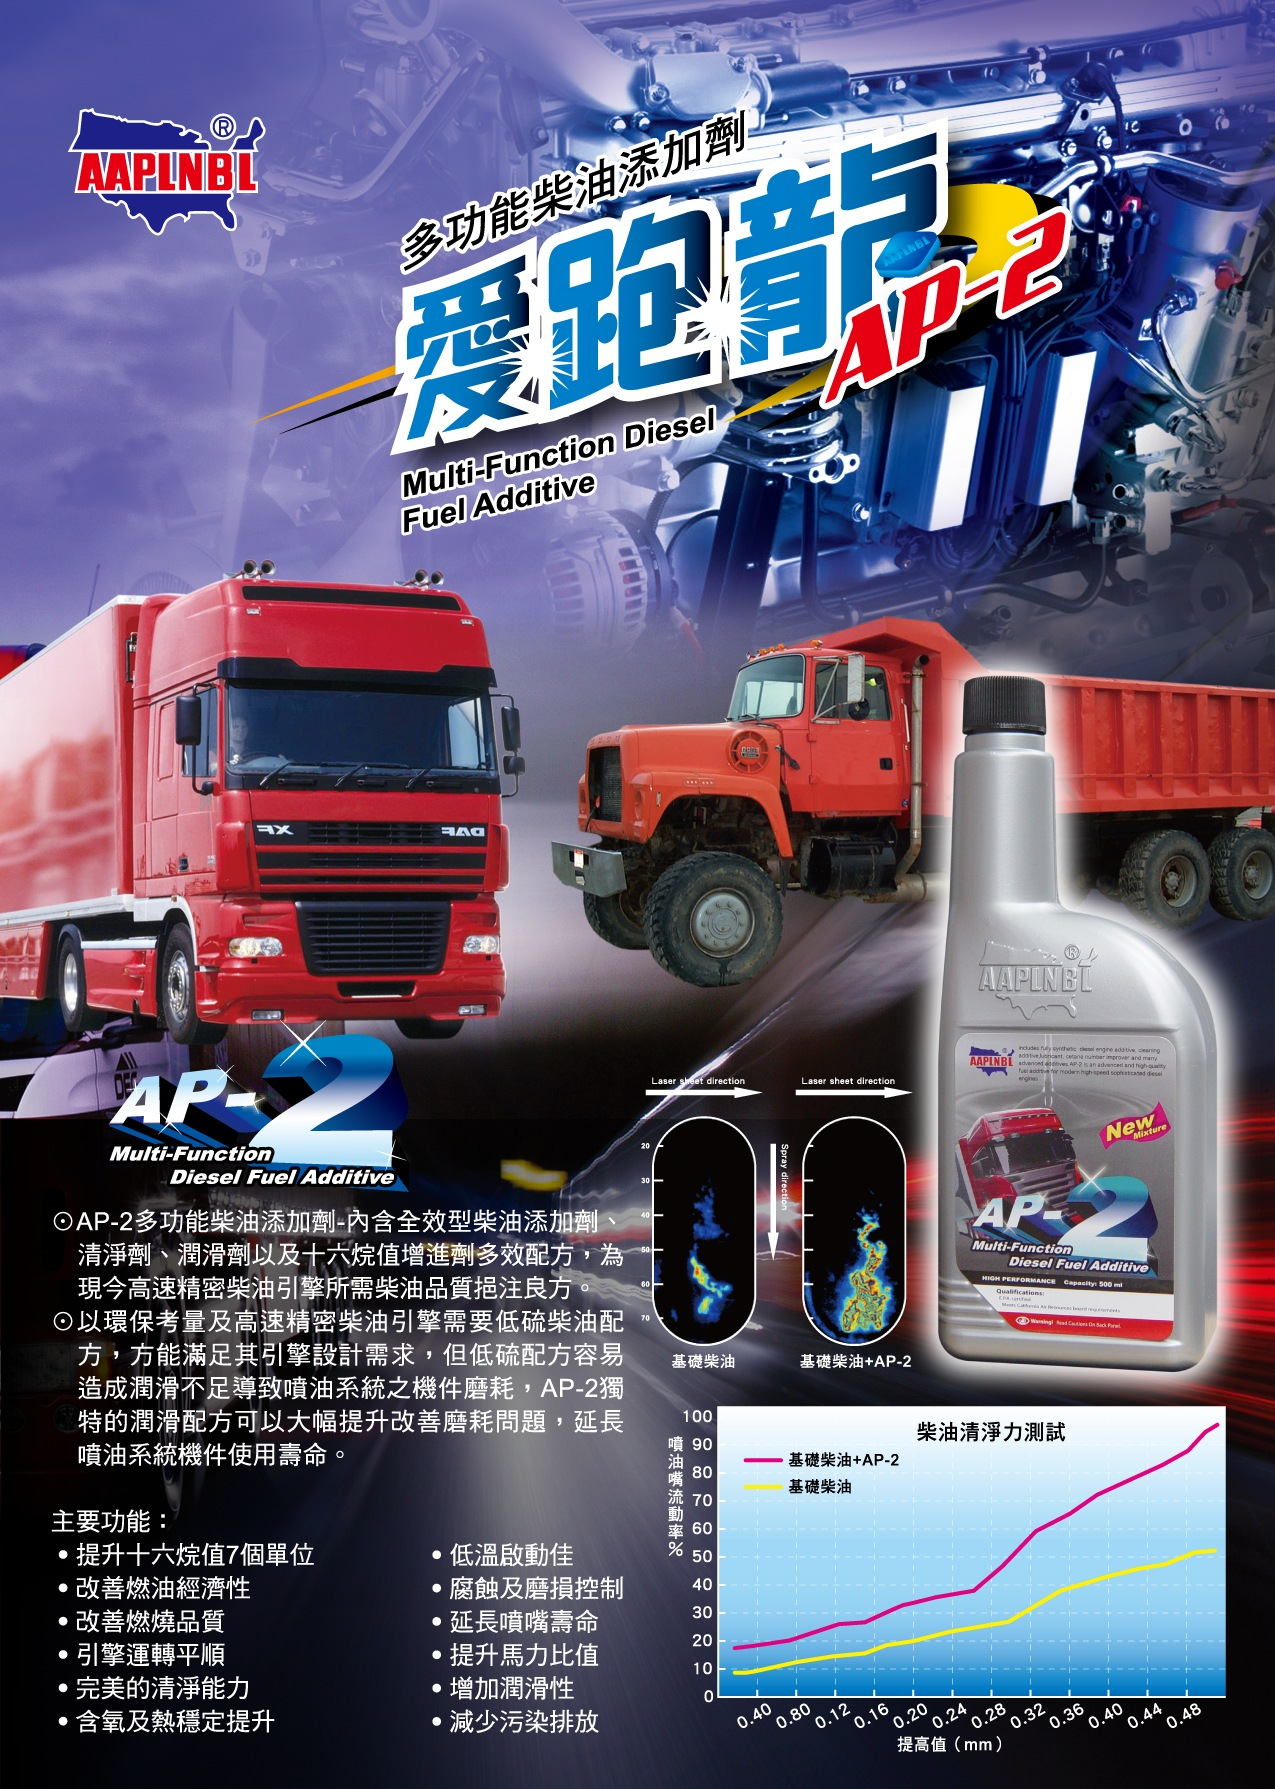 AP-2多功能柴油添加劑